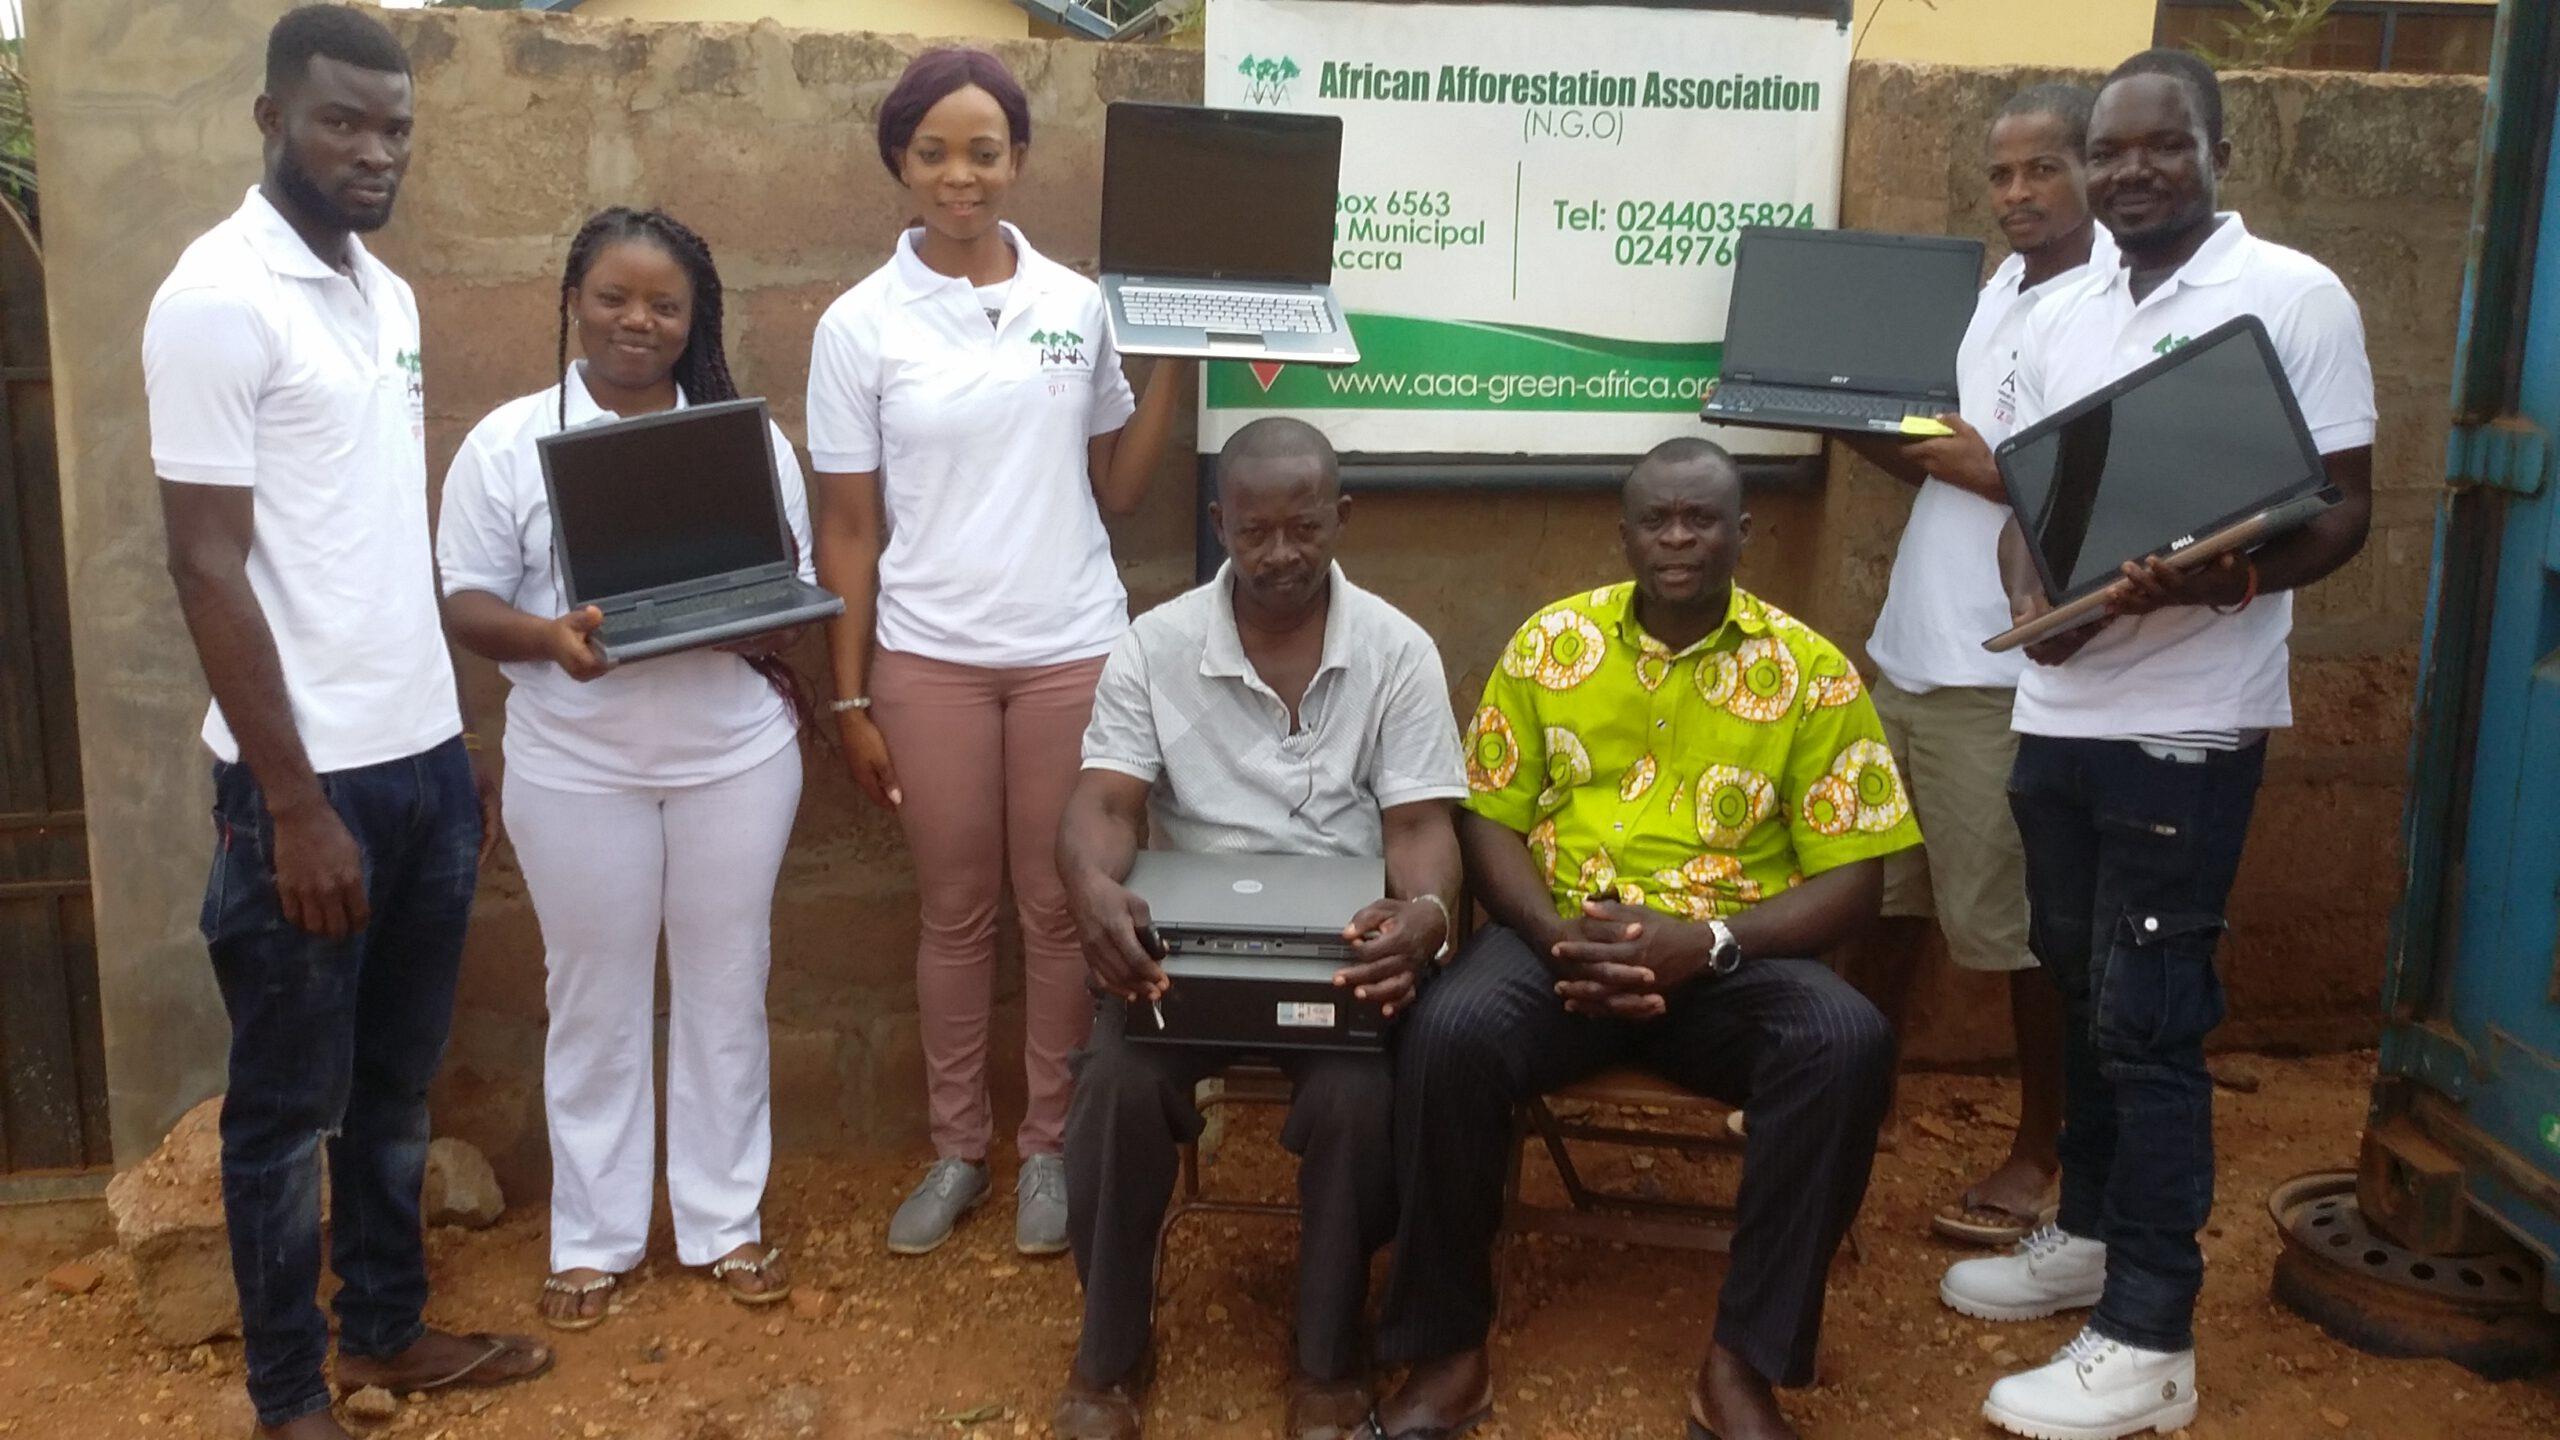 Aufforstung Afrika AAA Donation Accra Ghana scaled 1